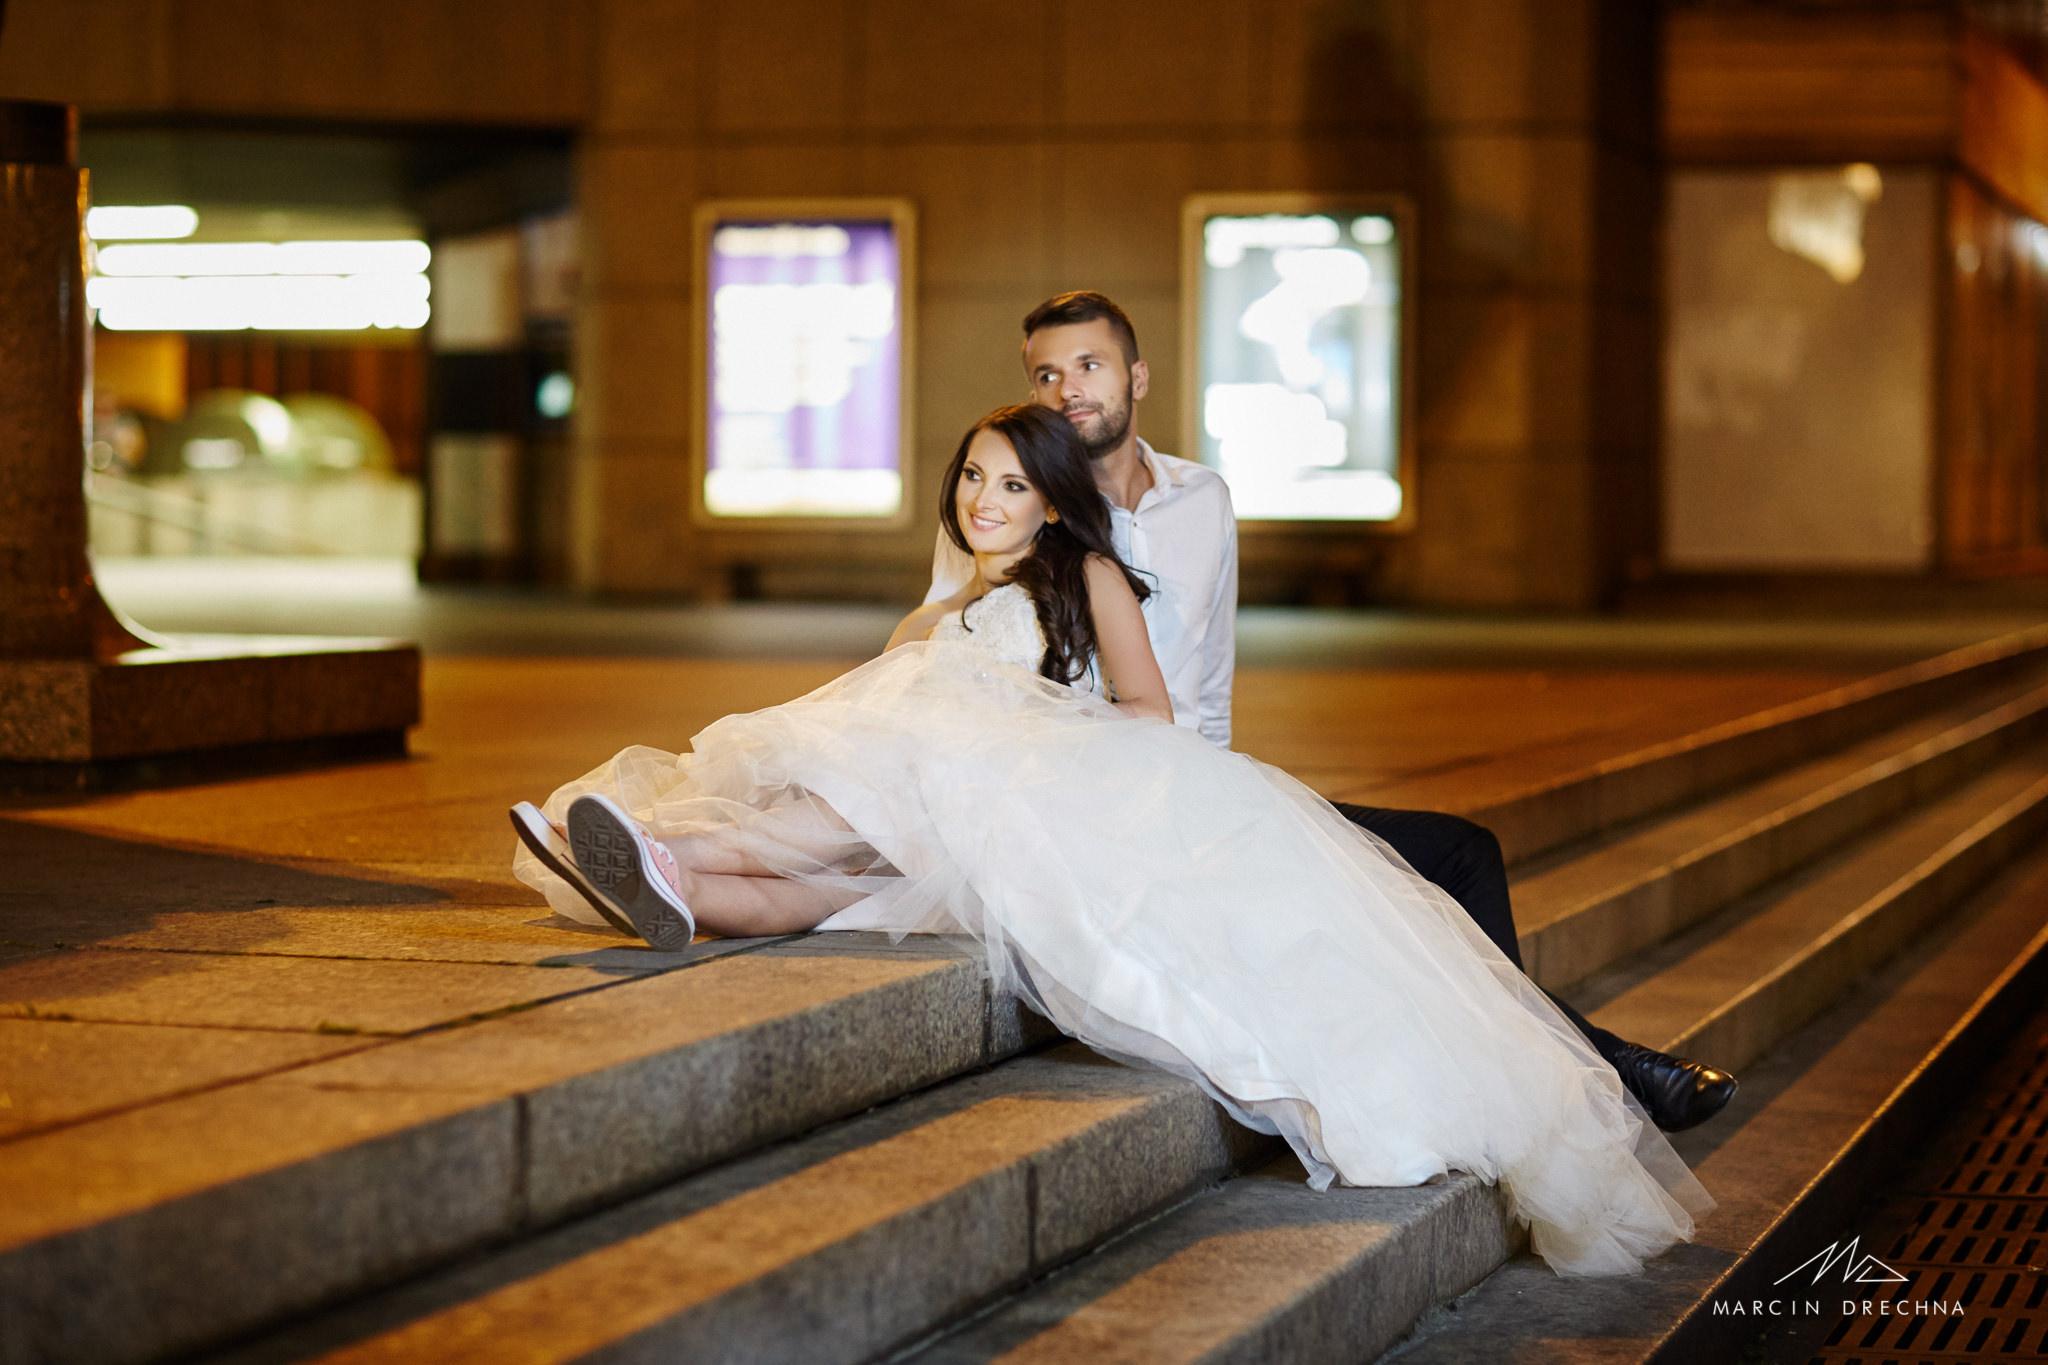 fotograf ślubny praga